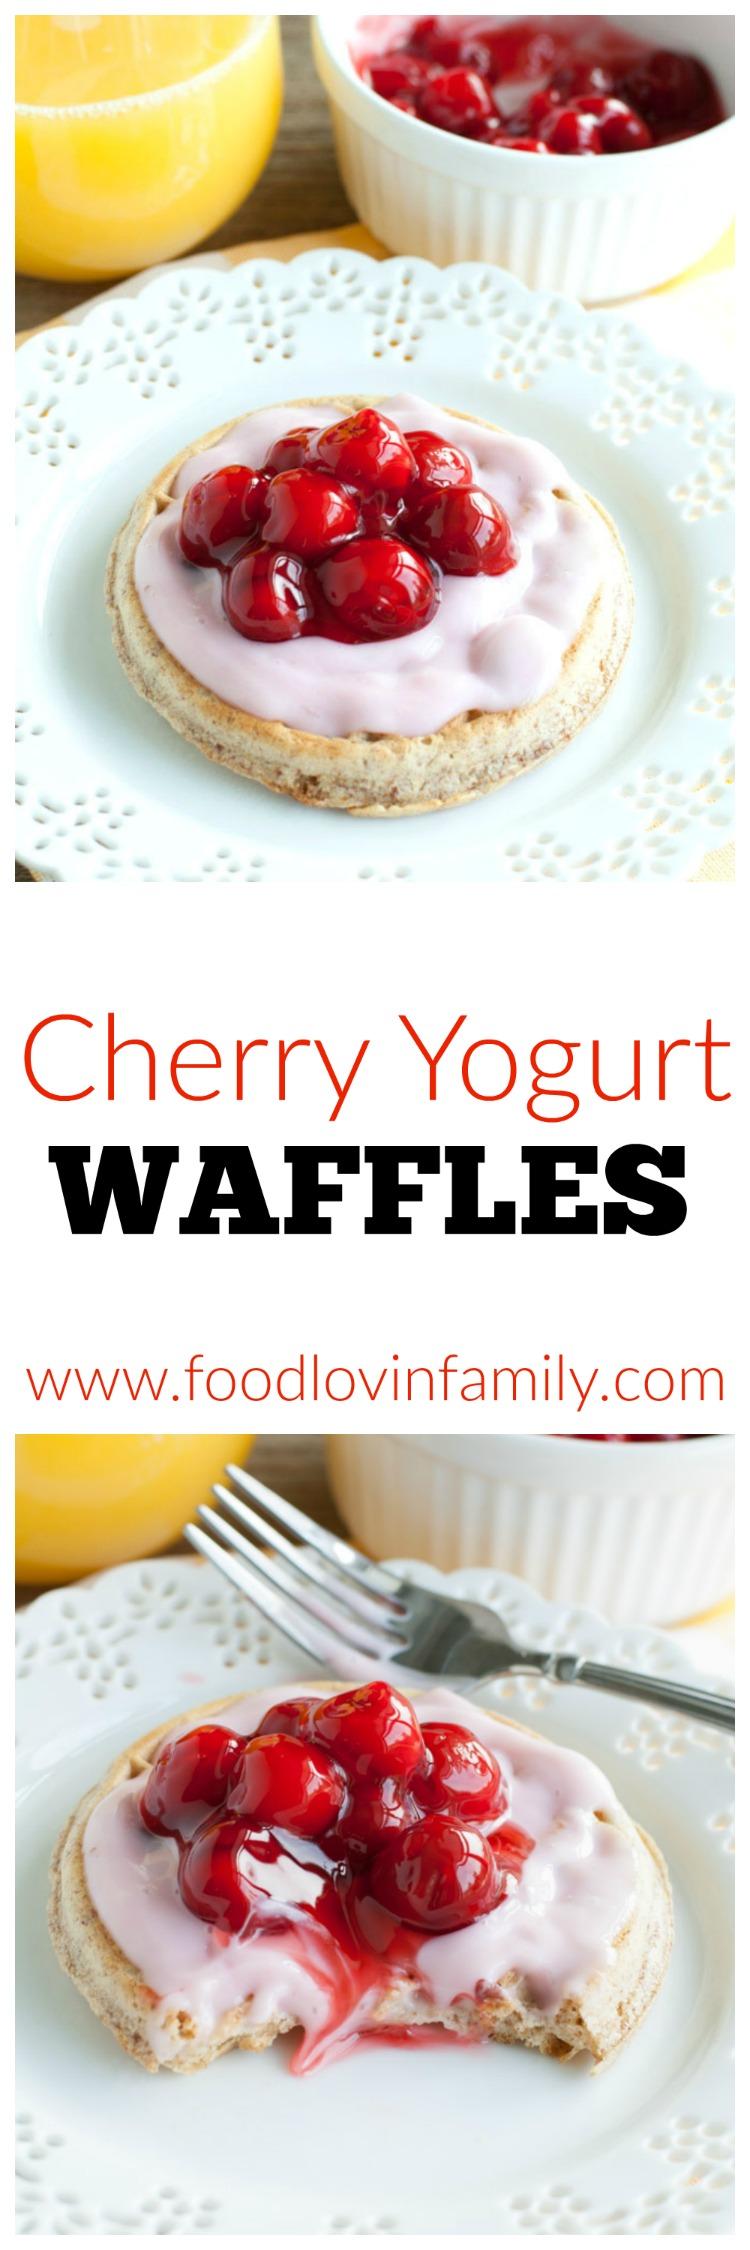 Cherry Yogurt Waffles PIN